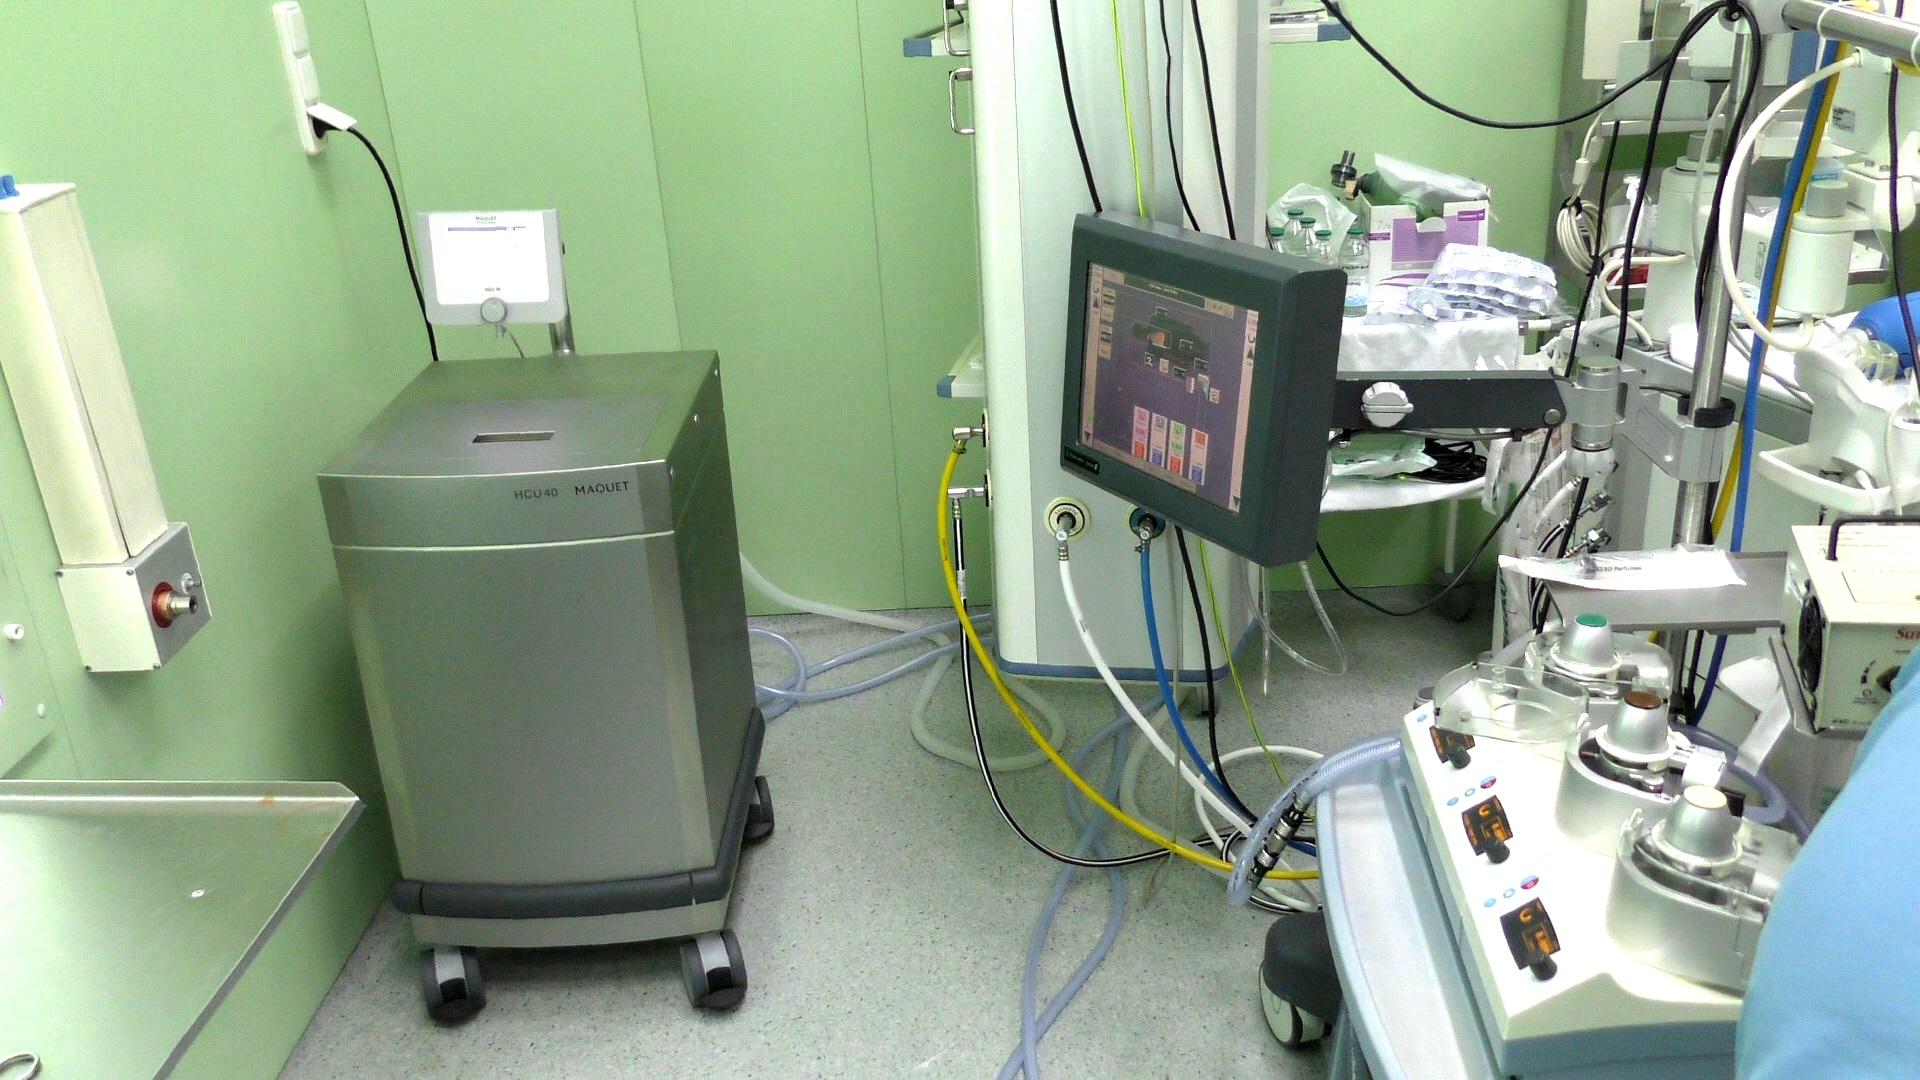 Корпорация ROSHEN передала детскому кардиоцентру терморегулирующий аппарат за 2 млн грн